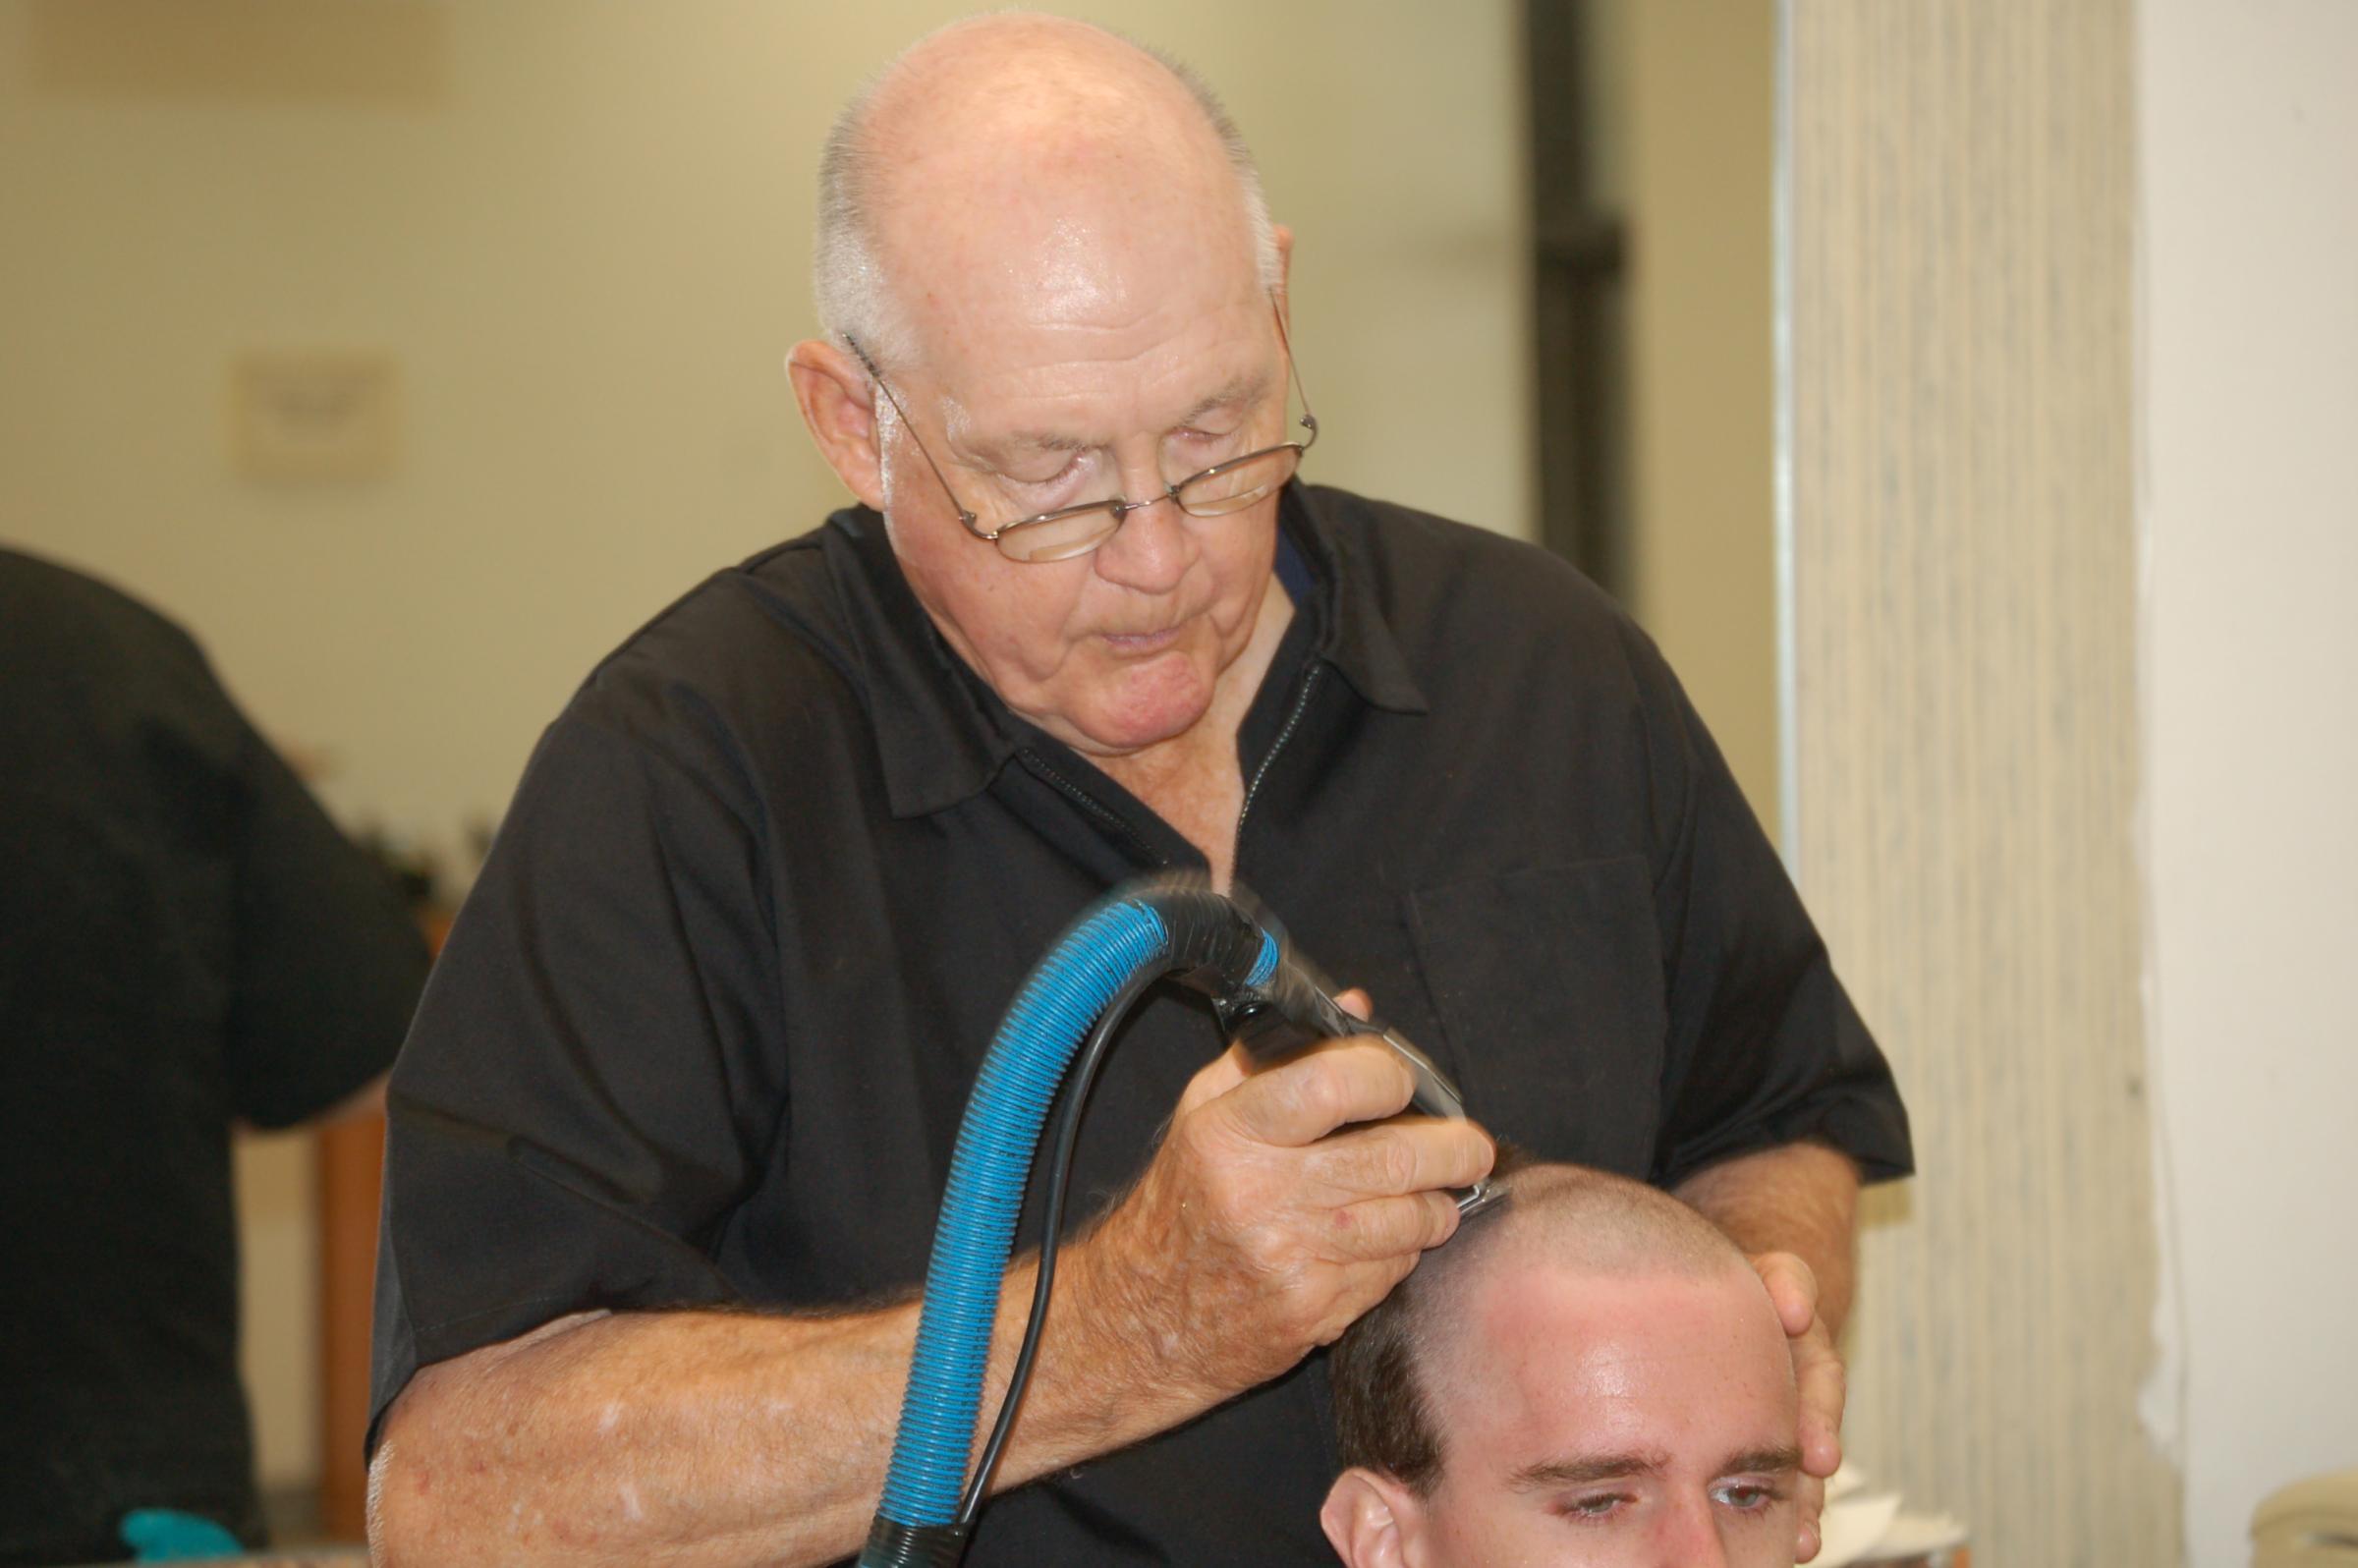 Barber Joint : ... for 51 years at the base barbershop at Joint Base San Antonio-Lackland